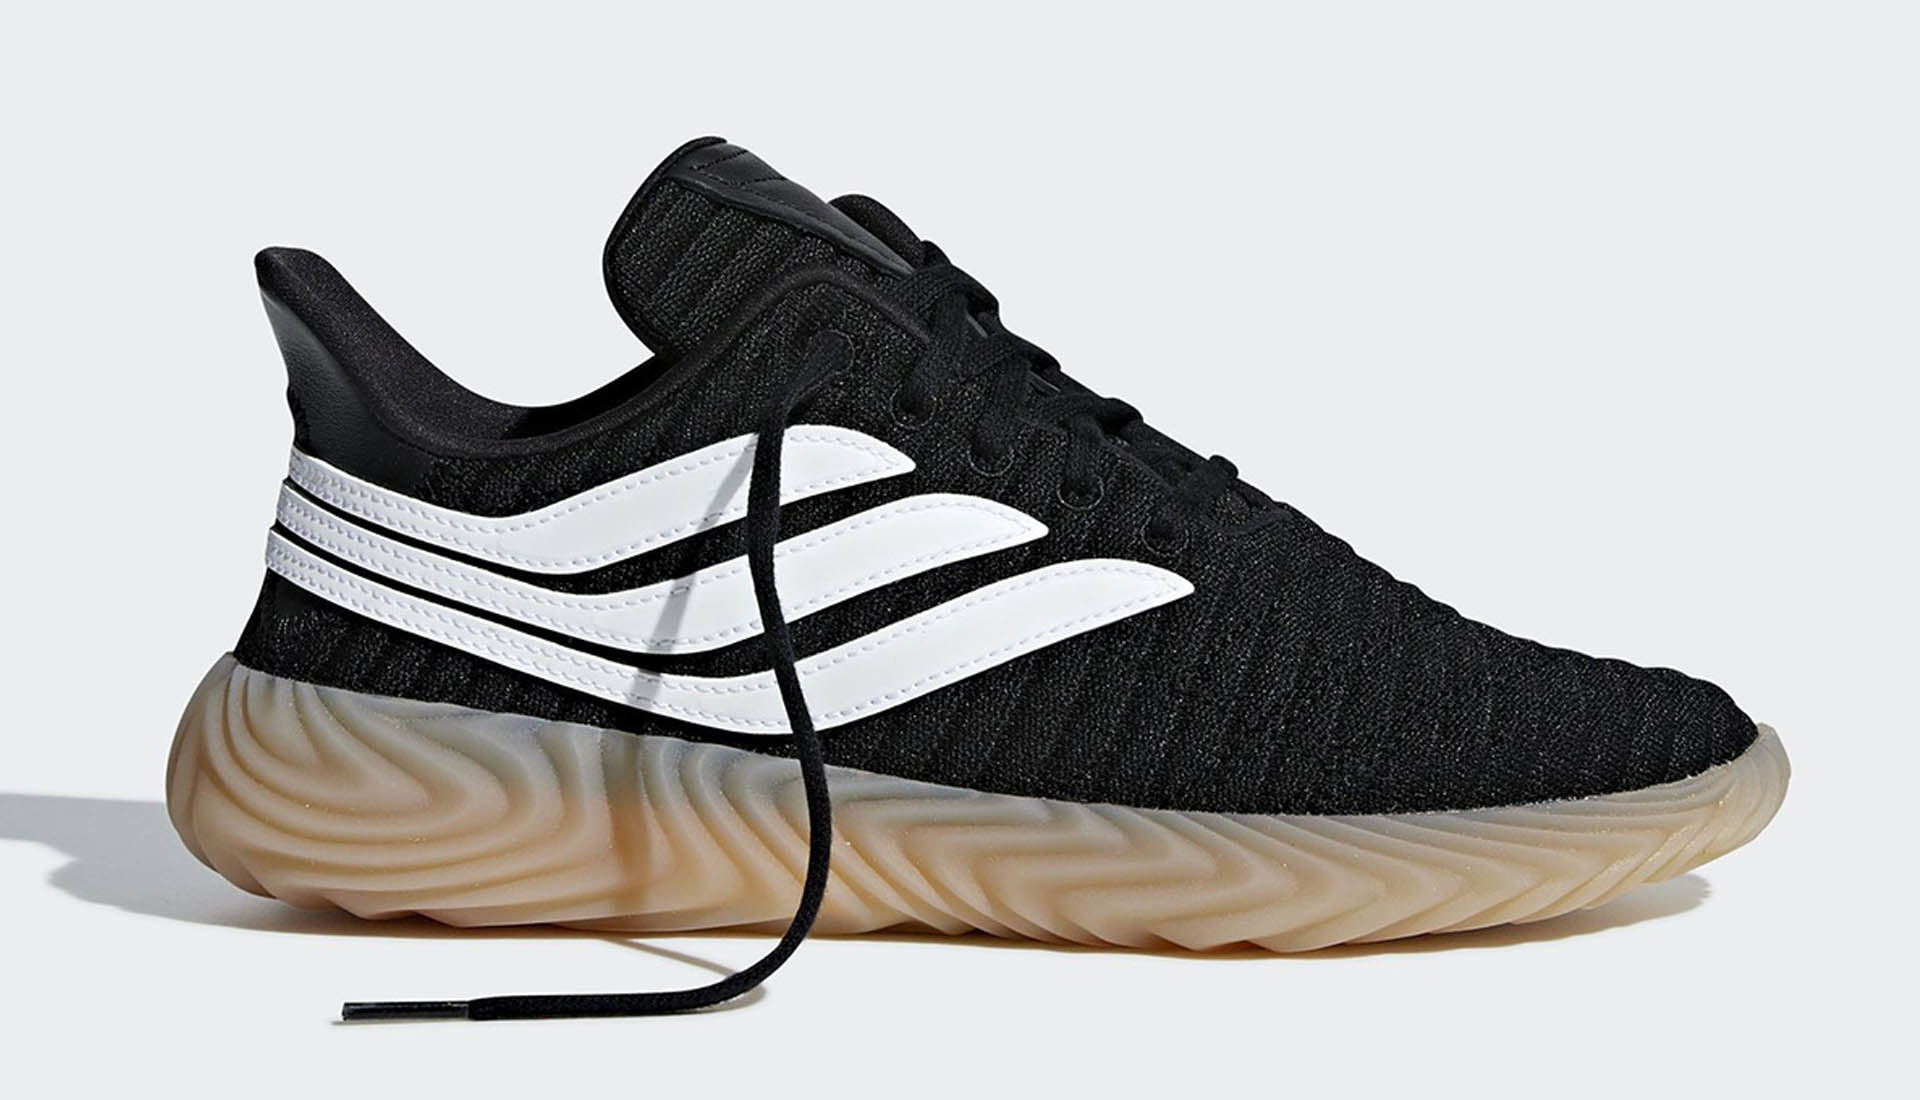 b57f139ef96e7f adidas Reveal The Football-Inspired Sobakov Sneaker - SoccerBible